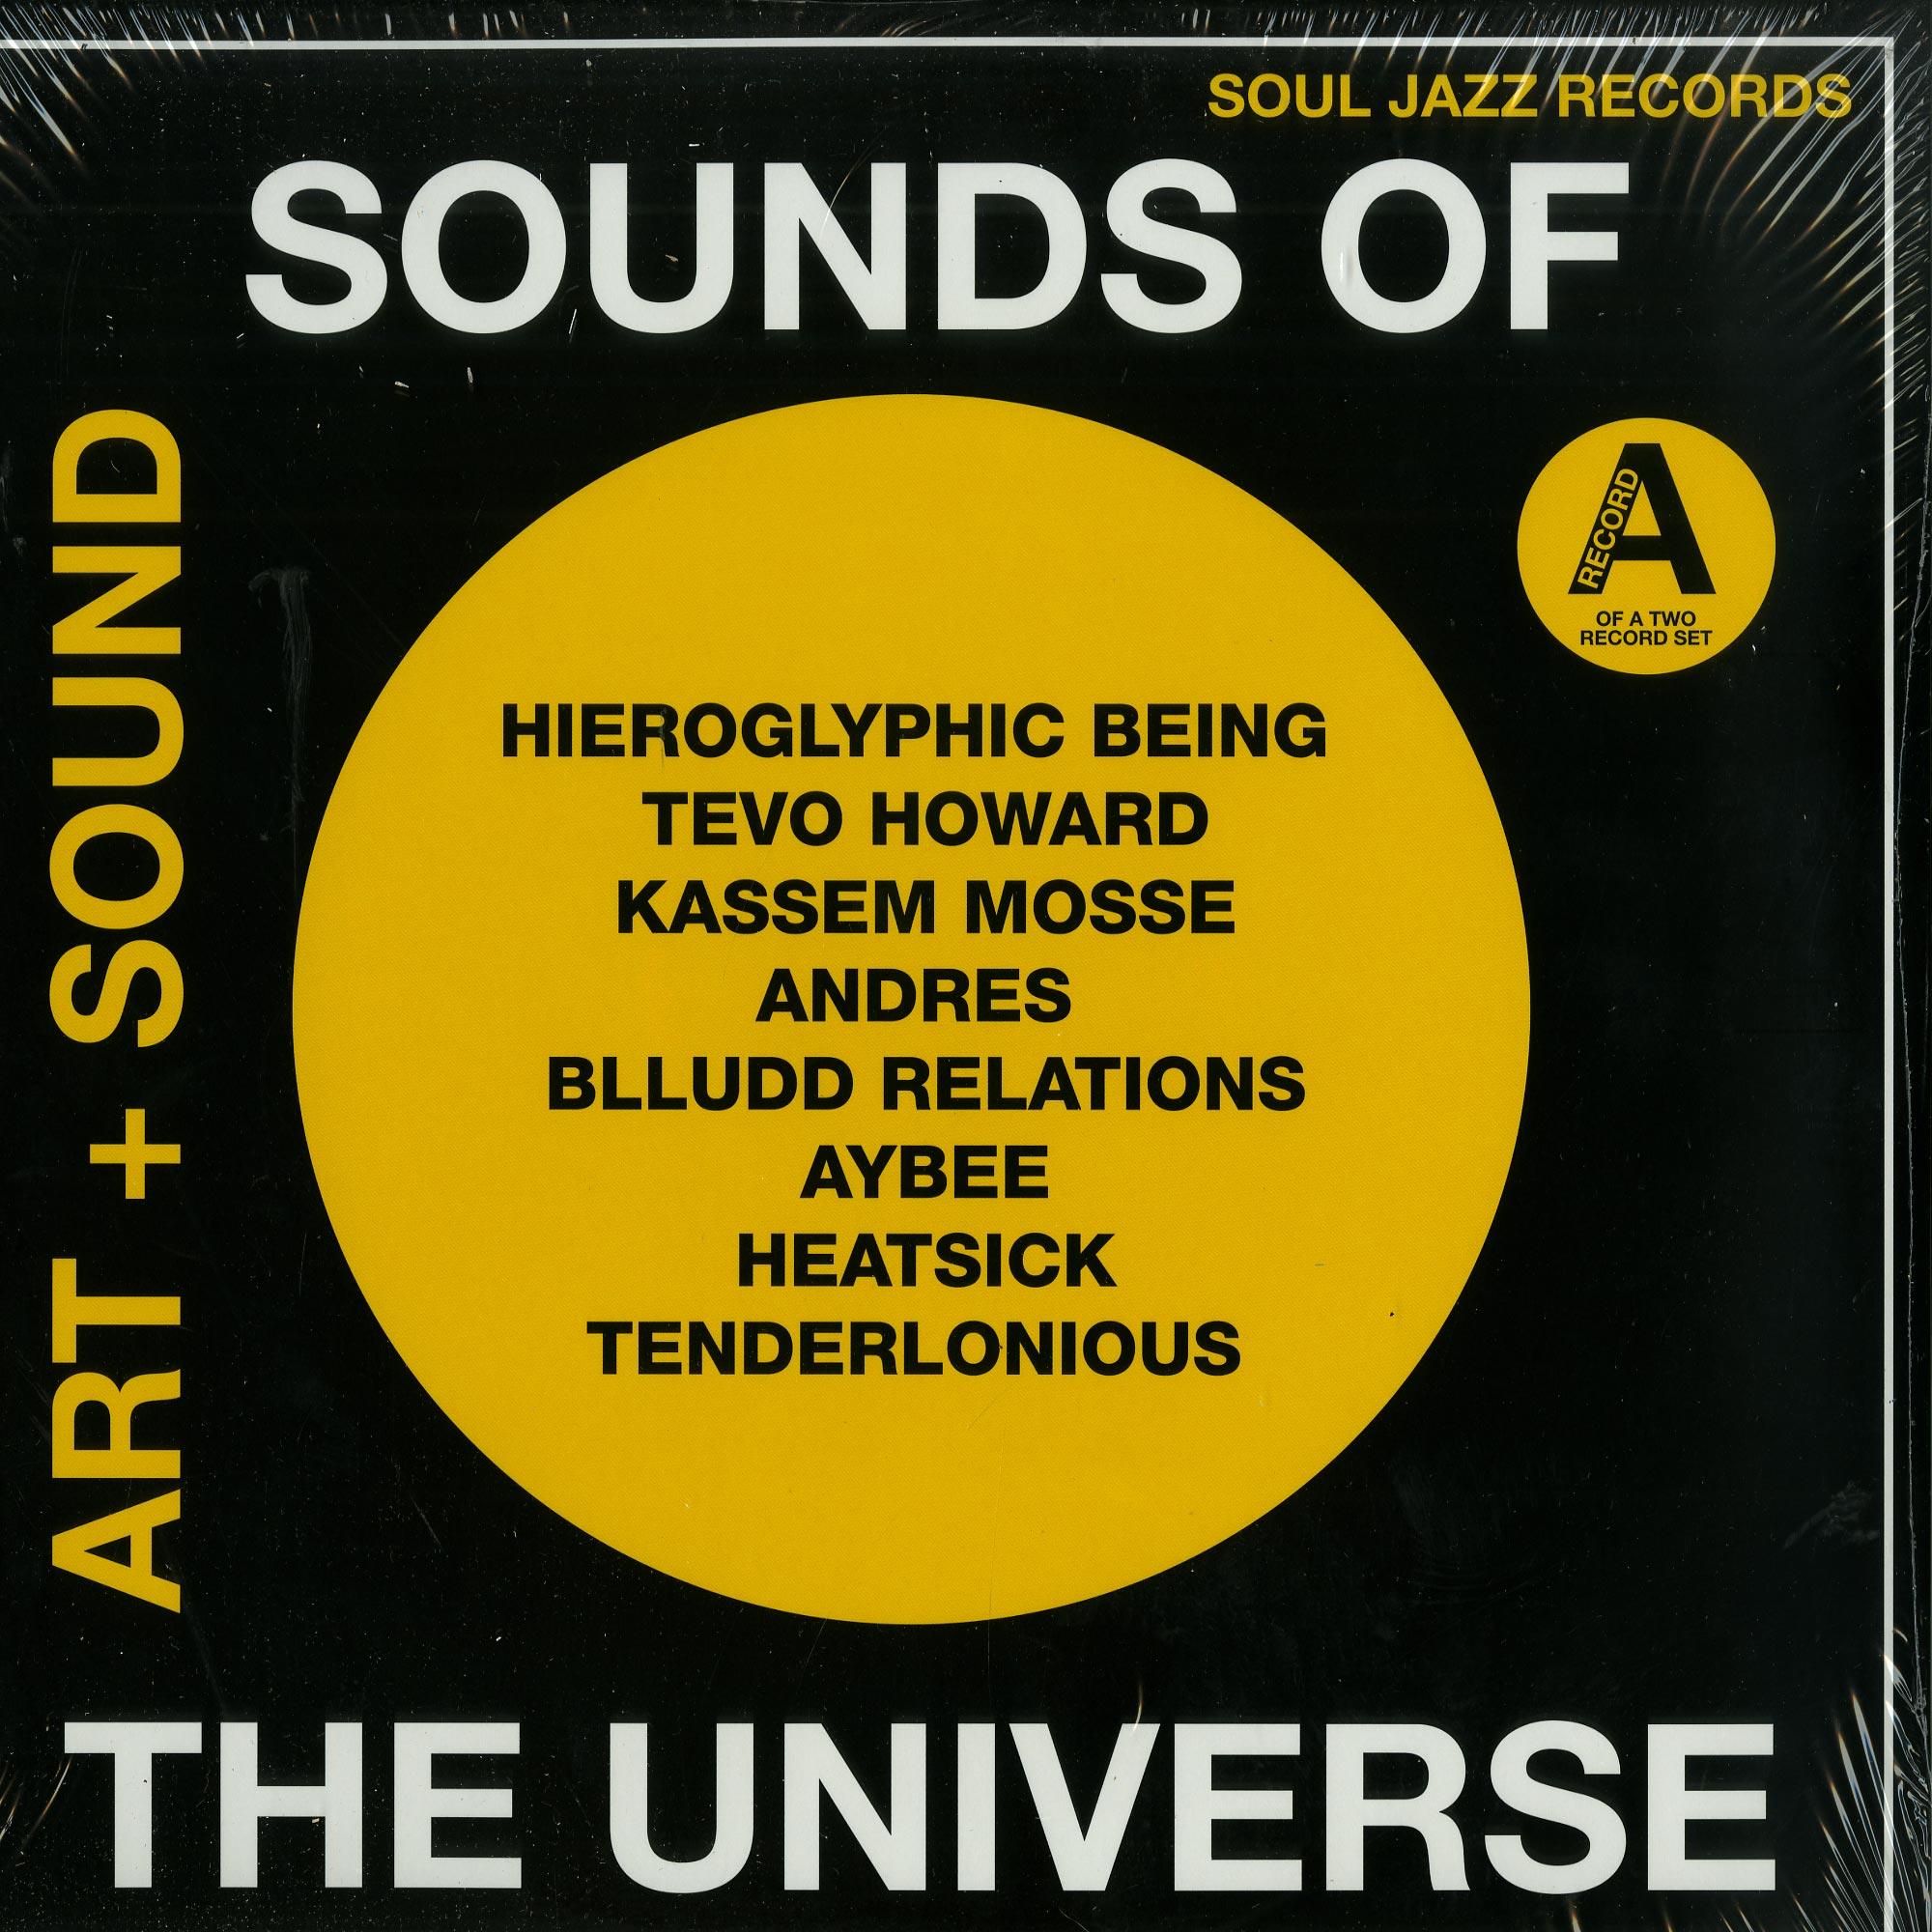 Various Artists - SOUNDS OF THE UNIVERSE: ART + SOUND PT. 1